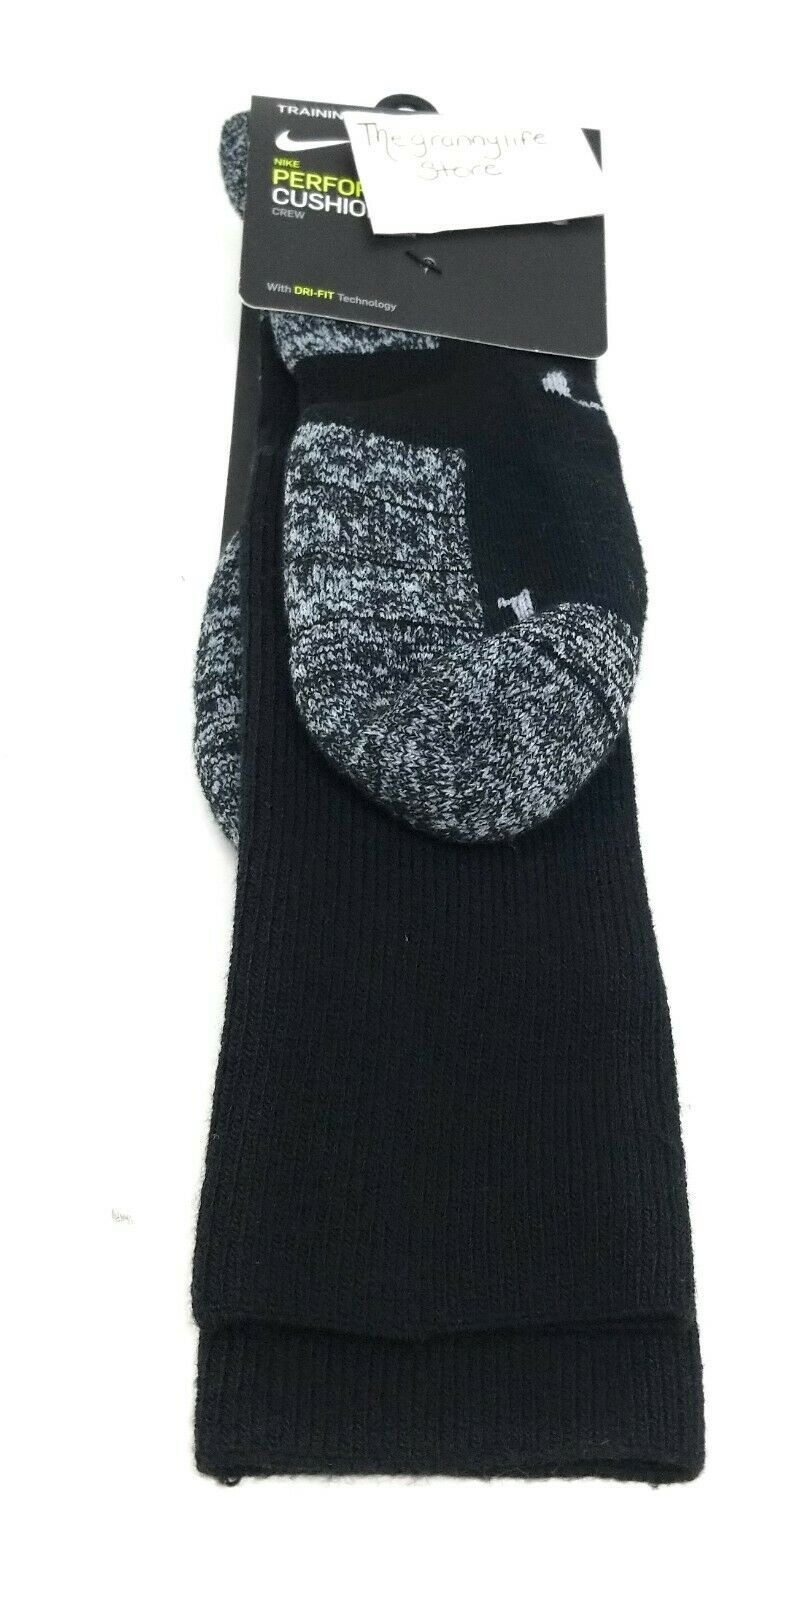 Nike Socks Crew Mens XL 12-15 Black Dri Fit Cushioned Athletic Performance Sport